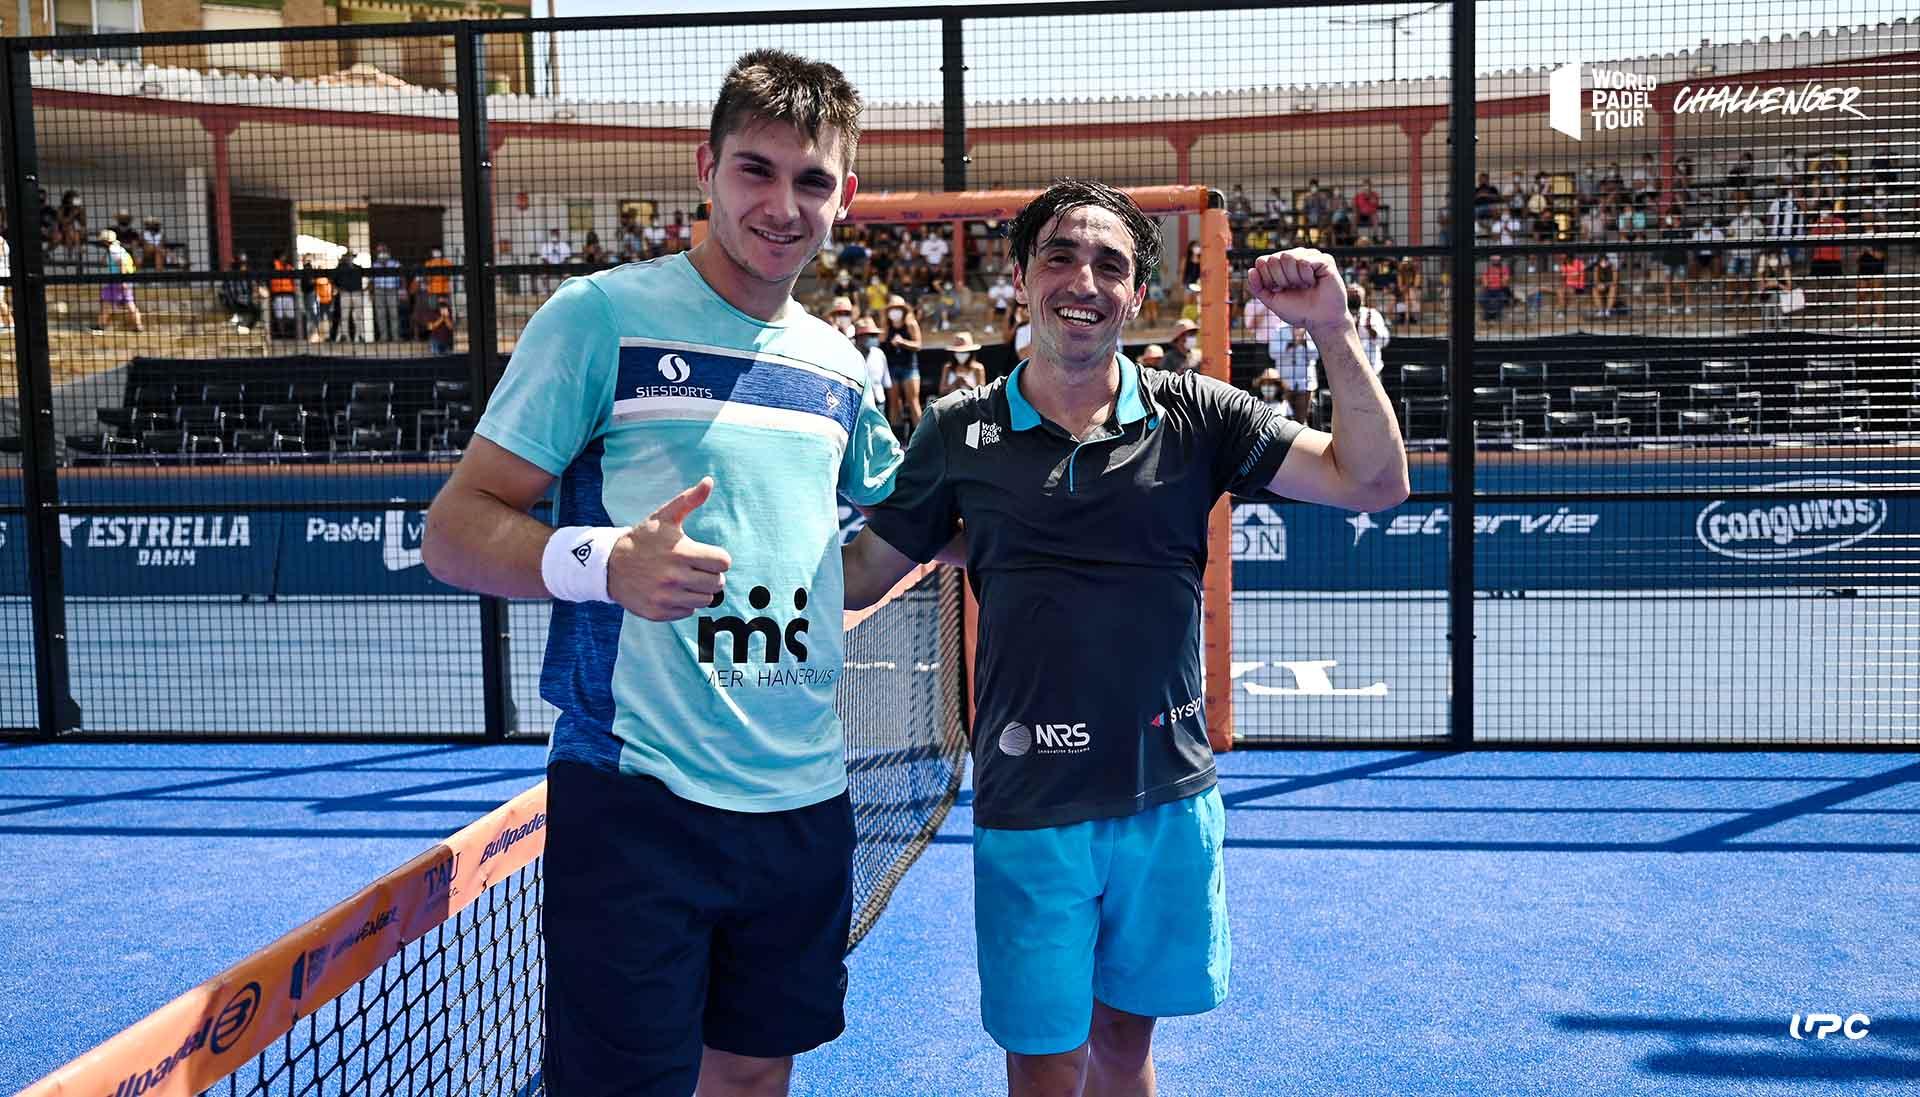 Ayats Perino victoire demi finale WPT Calanda Challenger 2021